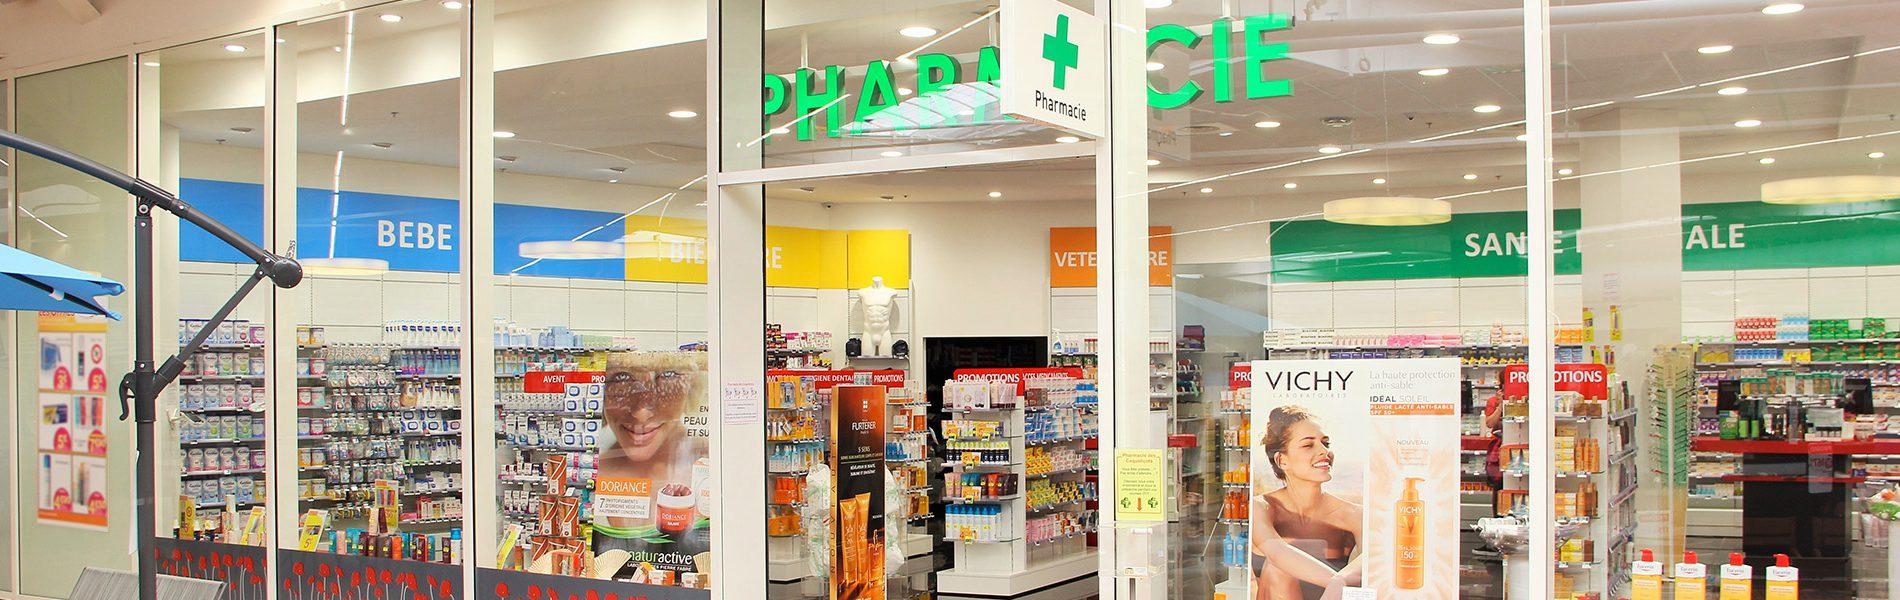 Pharmacie DES COQUELICOTS - Image Homepage 1